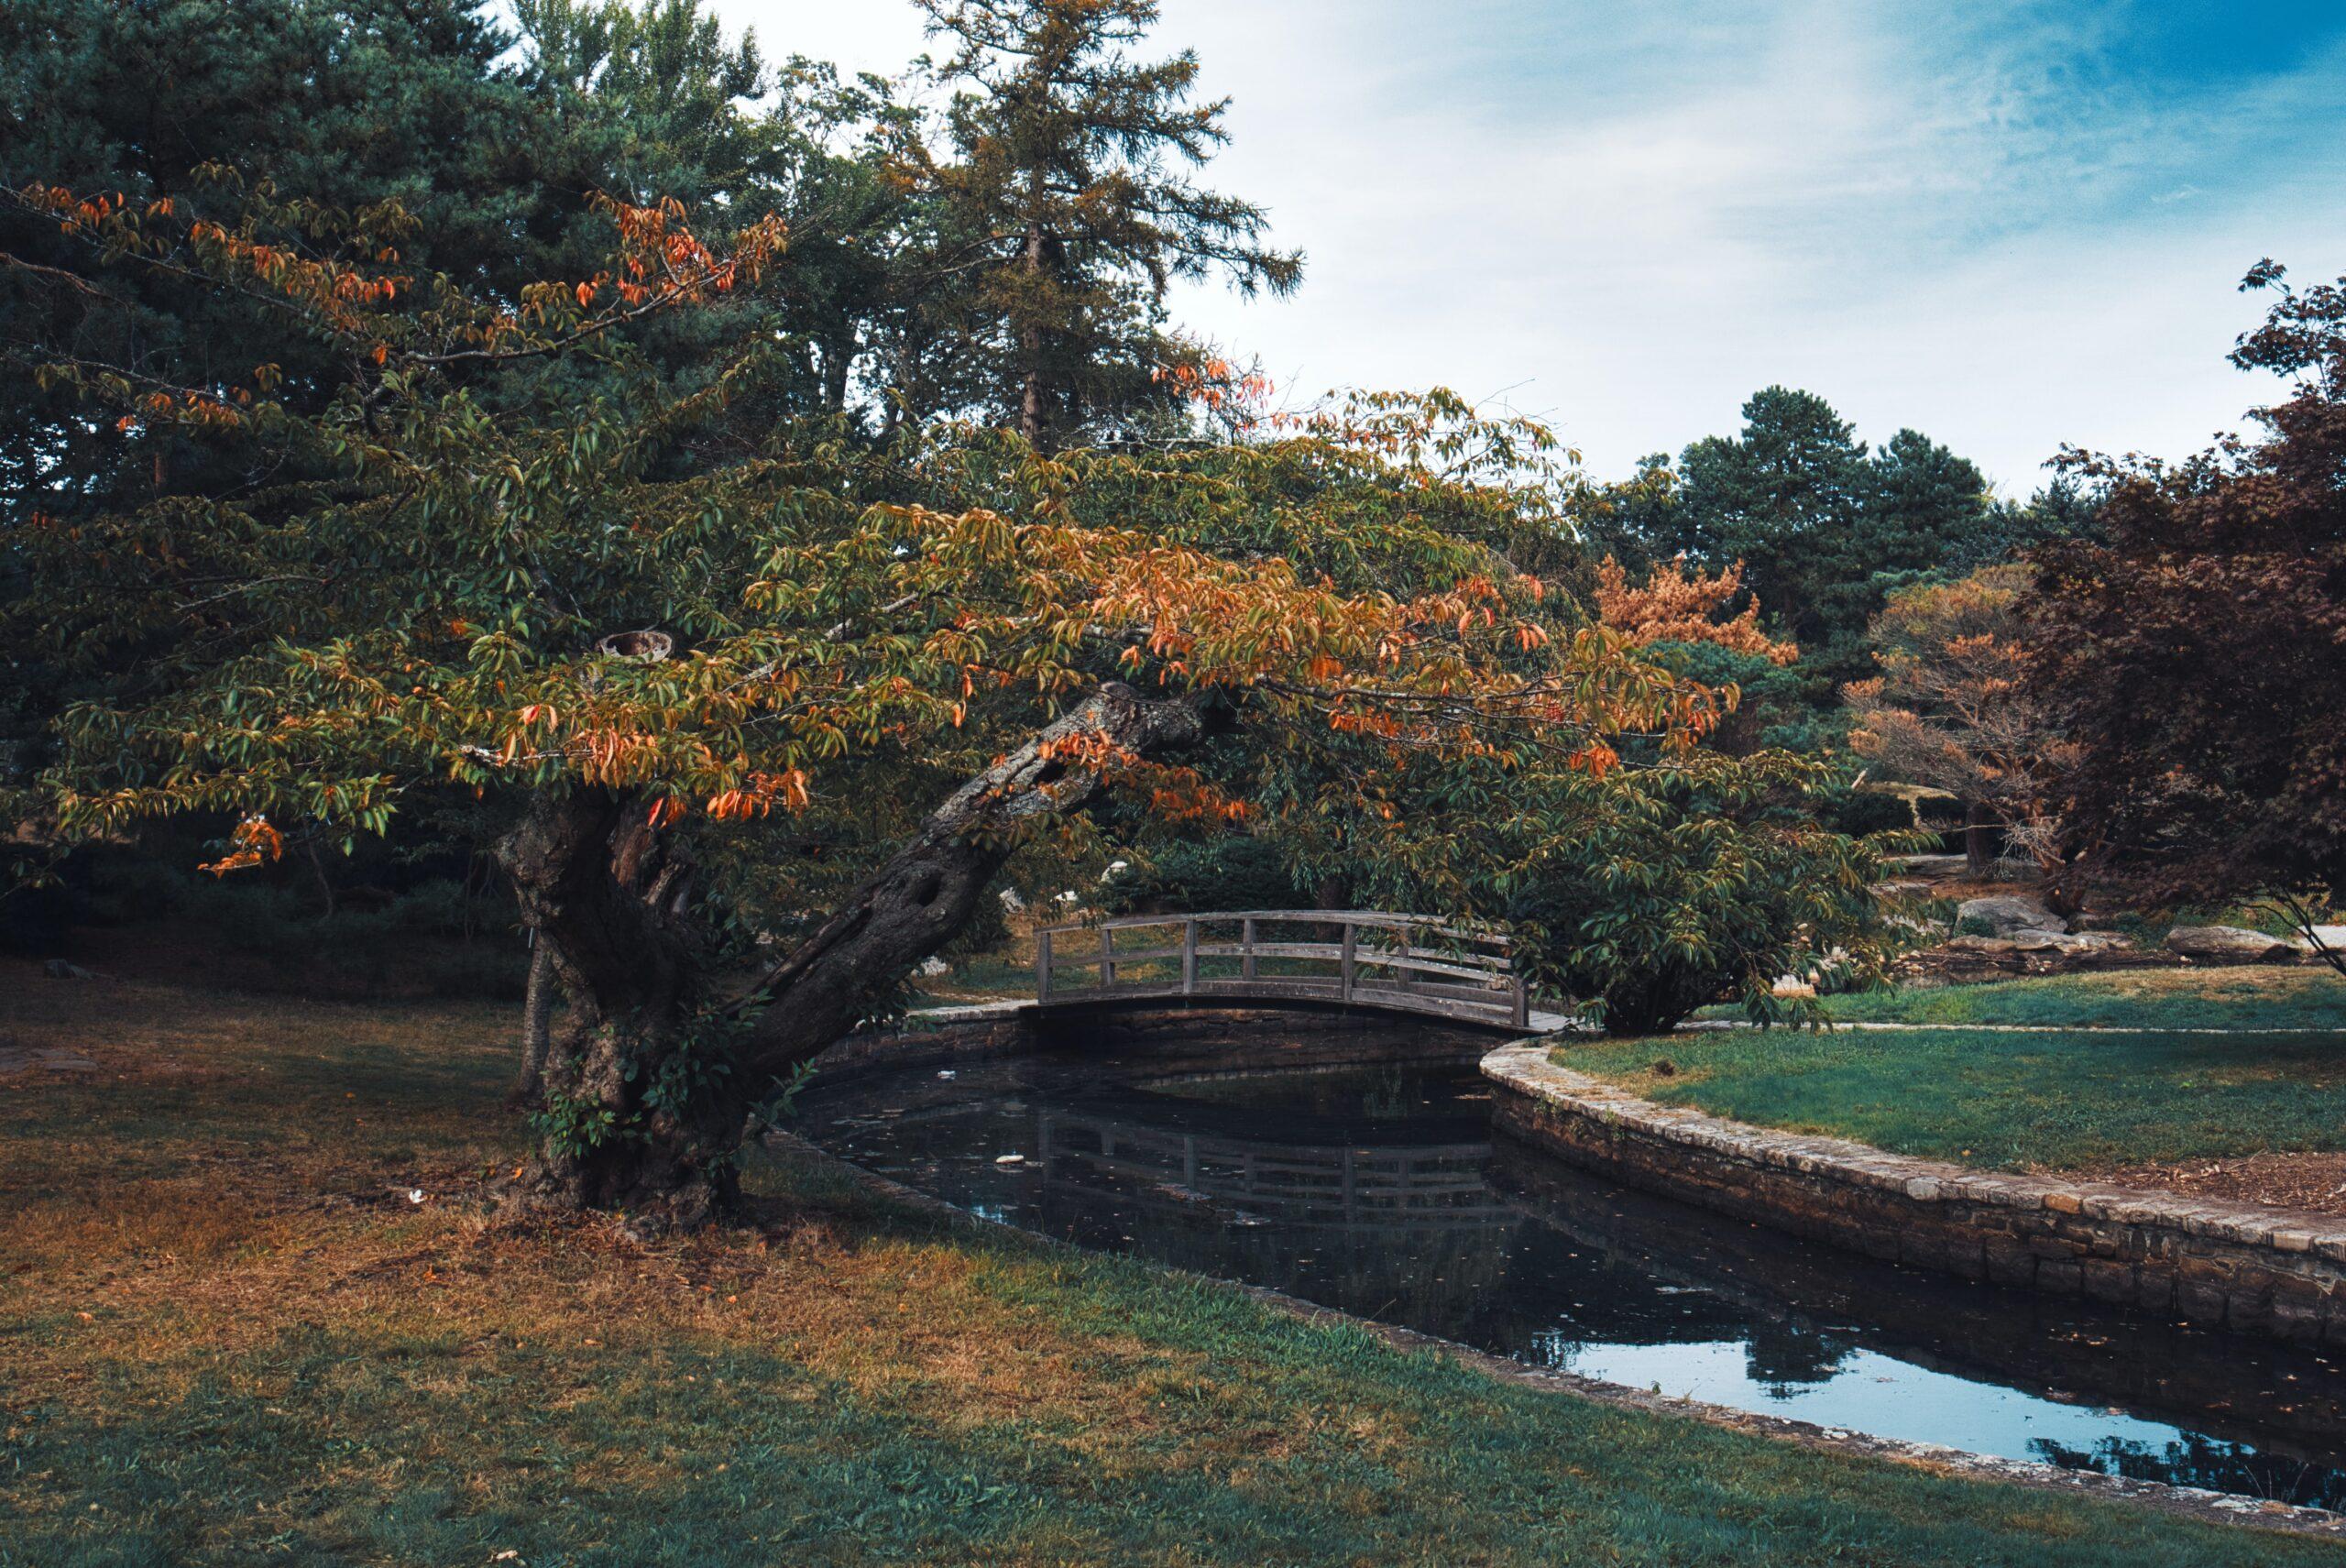 andrew-thornebrooke-Tokyo Gardens with stream and natural bridge-unsplash